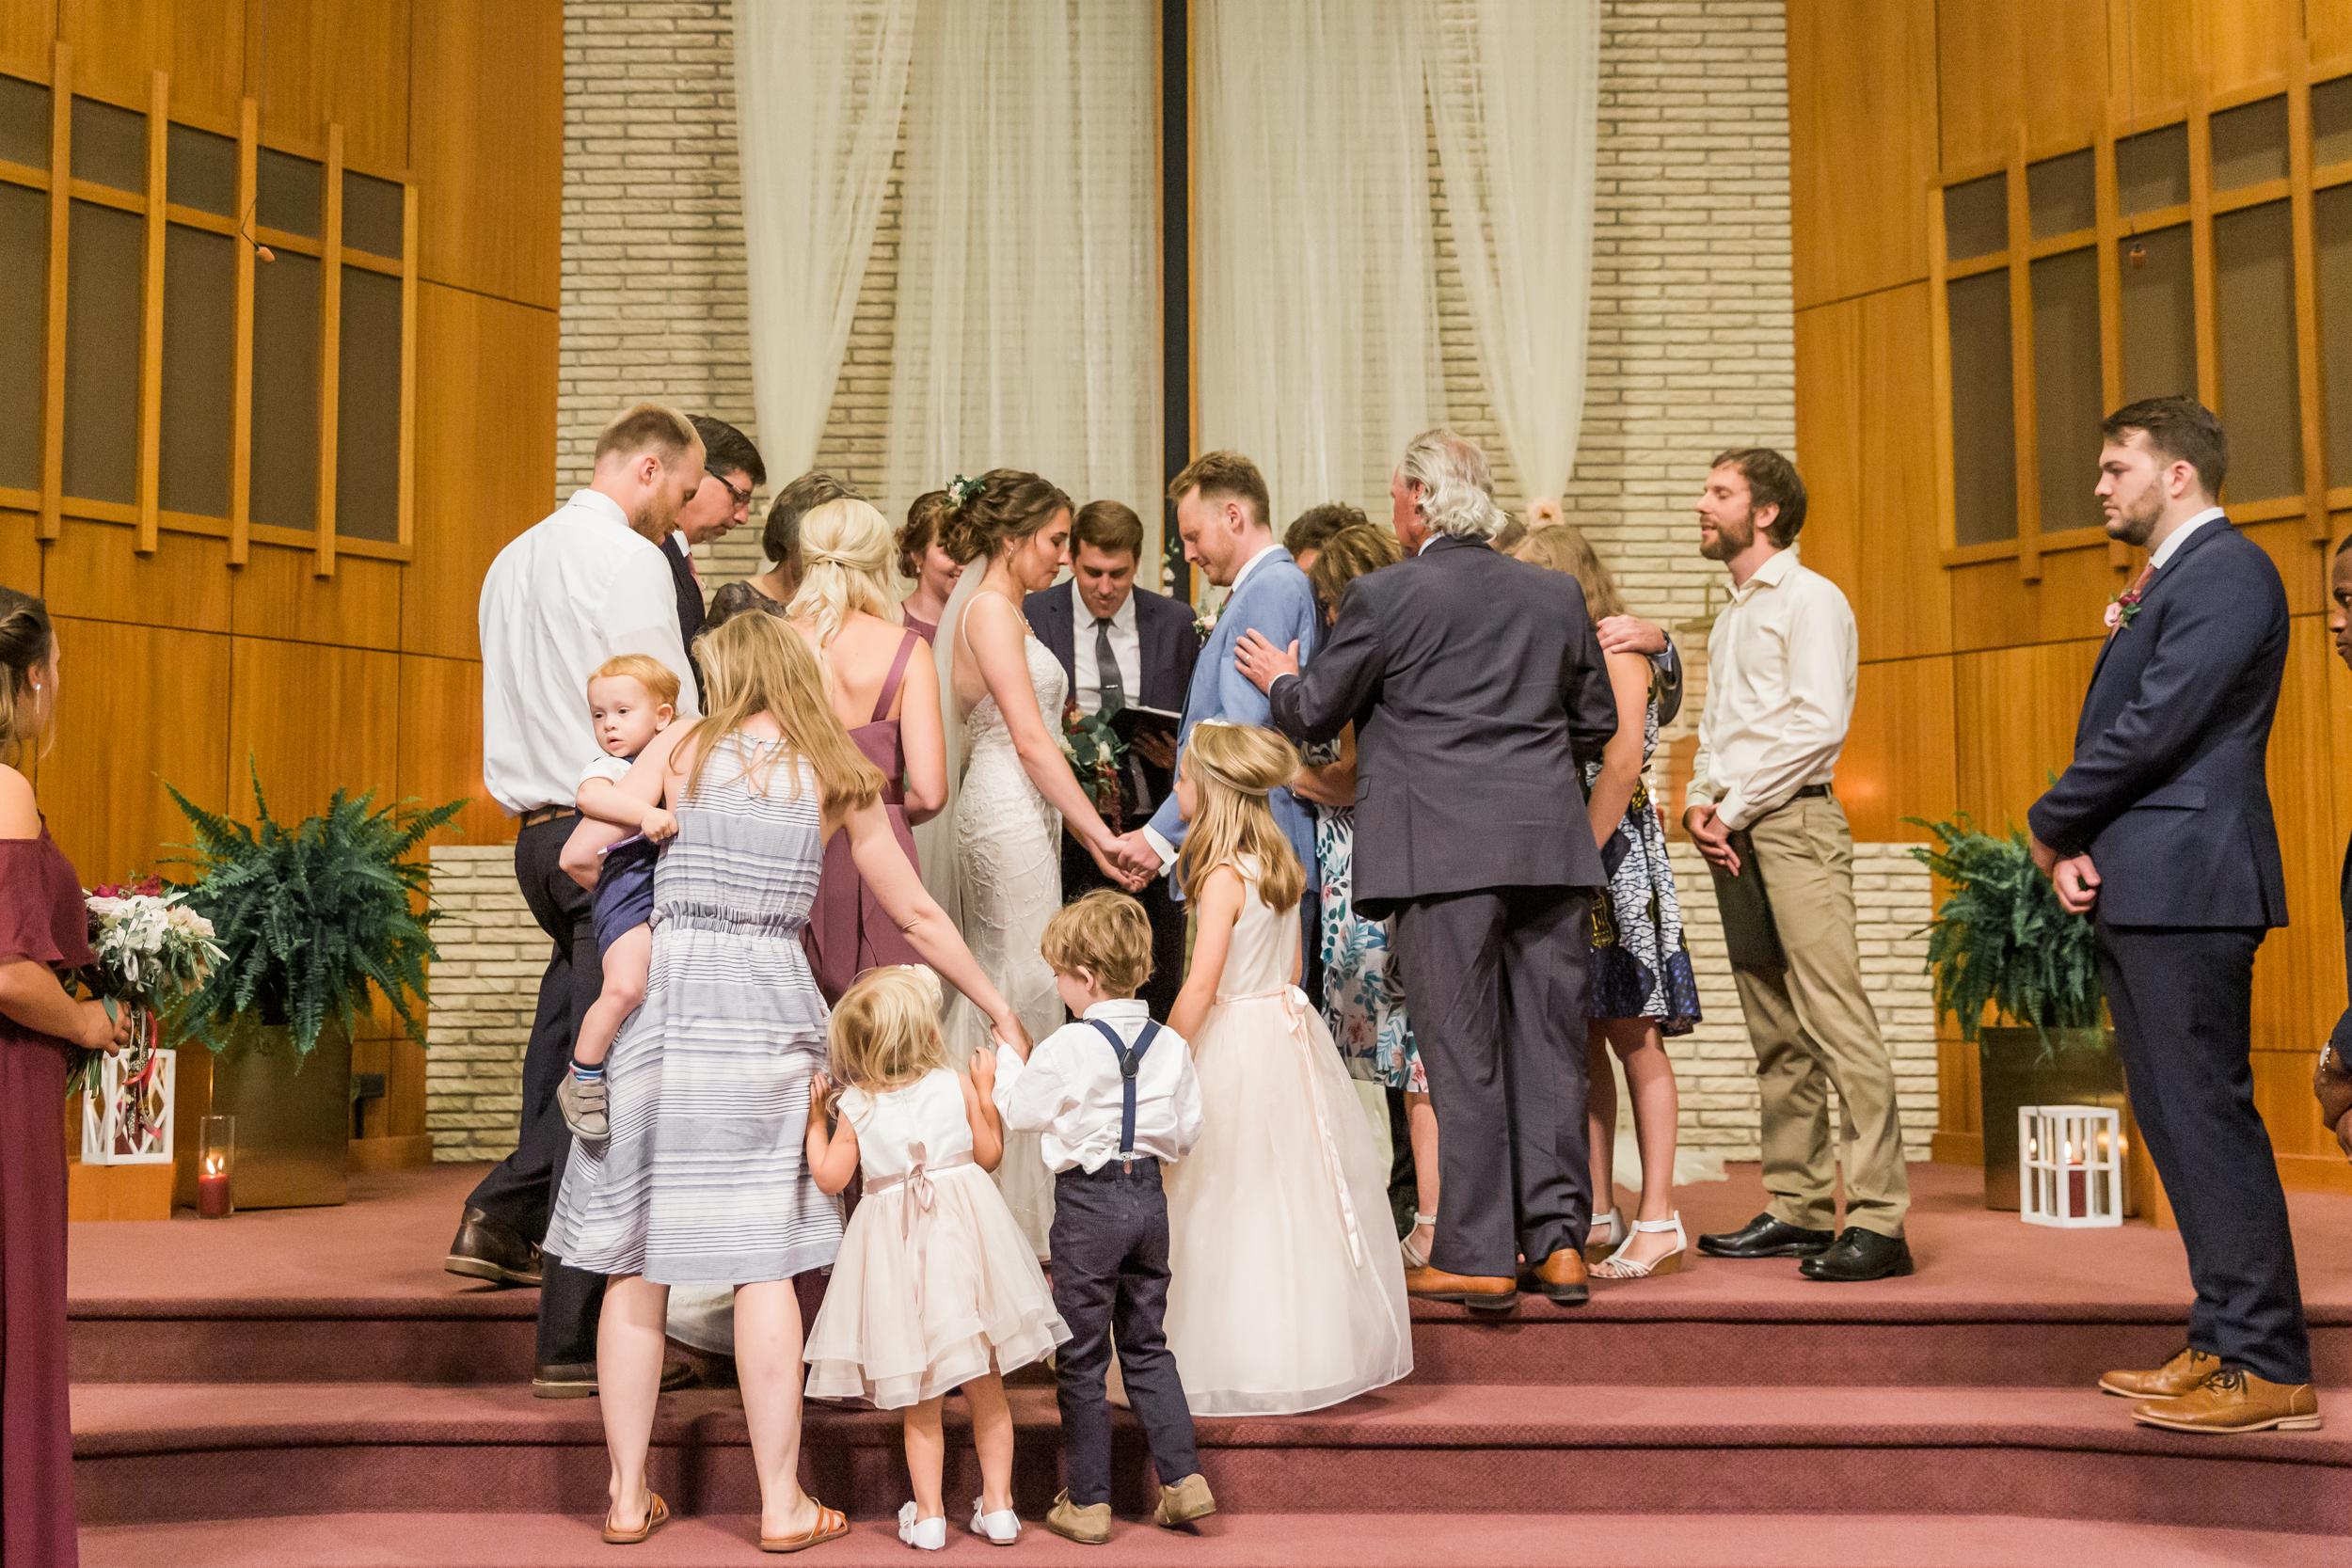 calebclairewedding-53.jpg